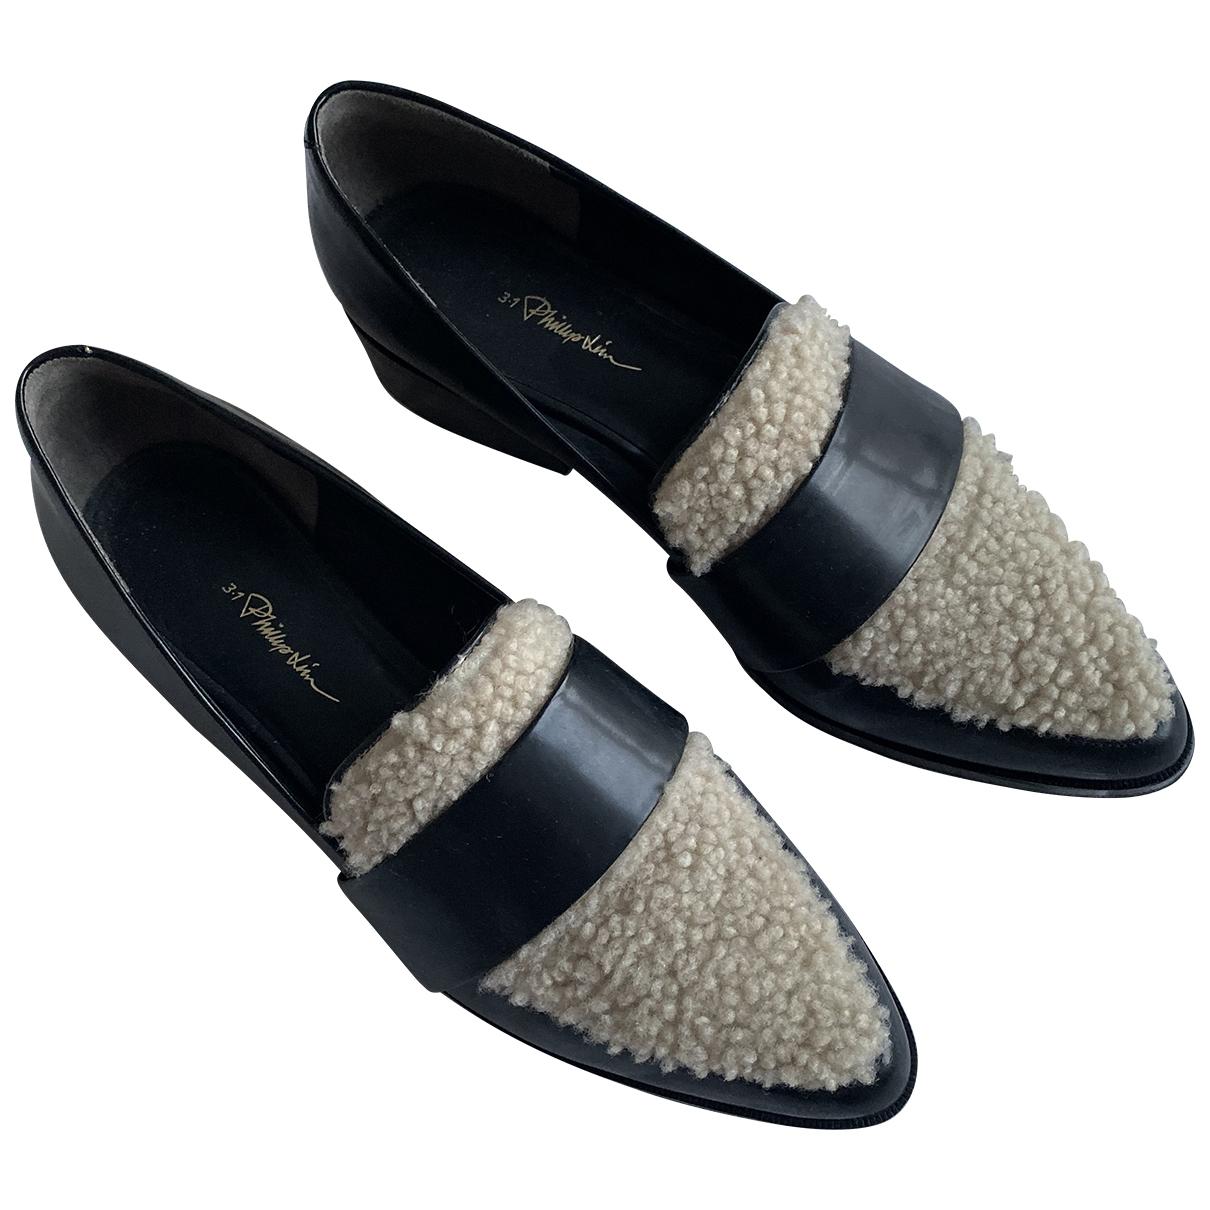 3.1 Phillip Lim \N Black Leather Flats for Women 40 EU